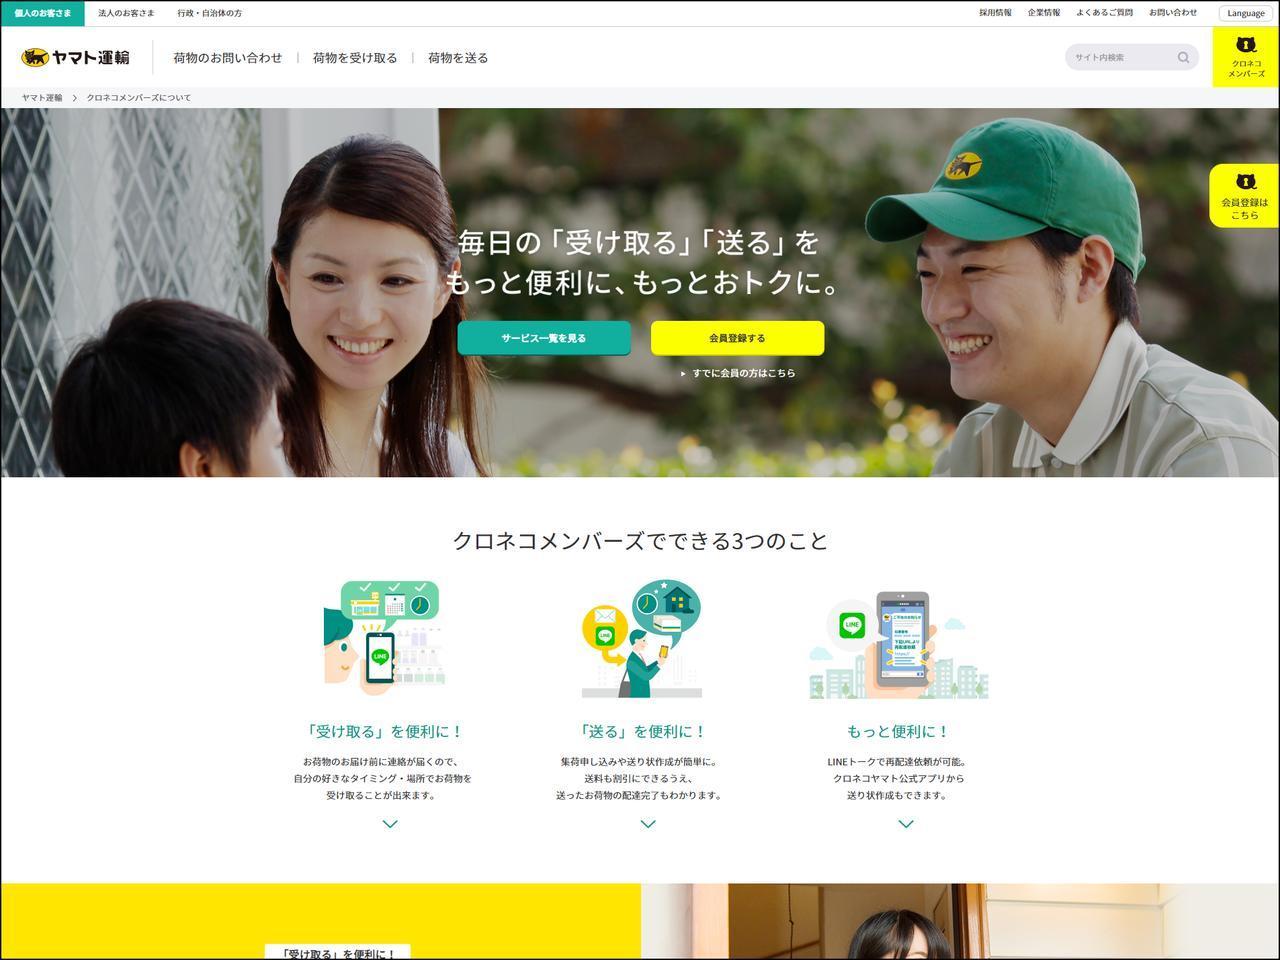 画像: www.kuronekoyamato.co.jp